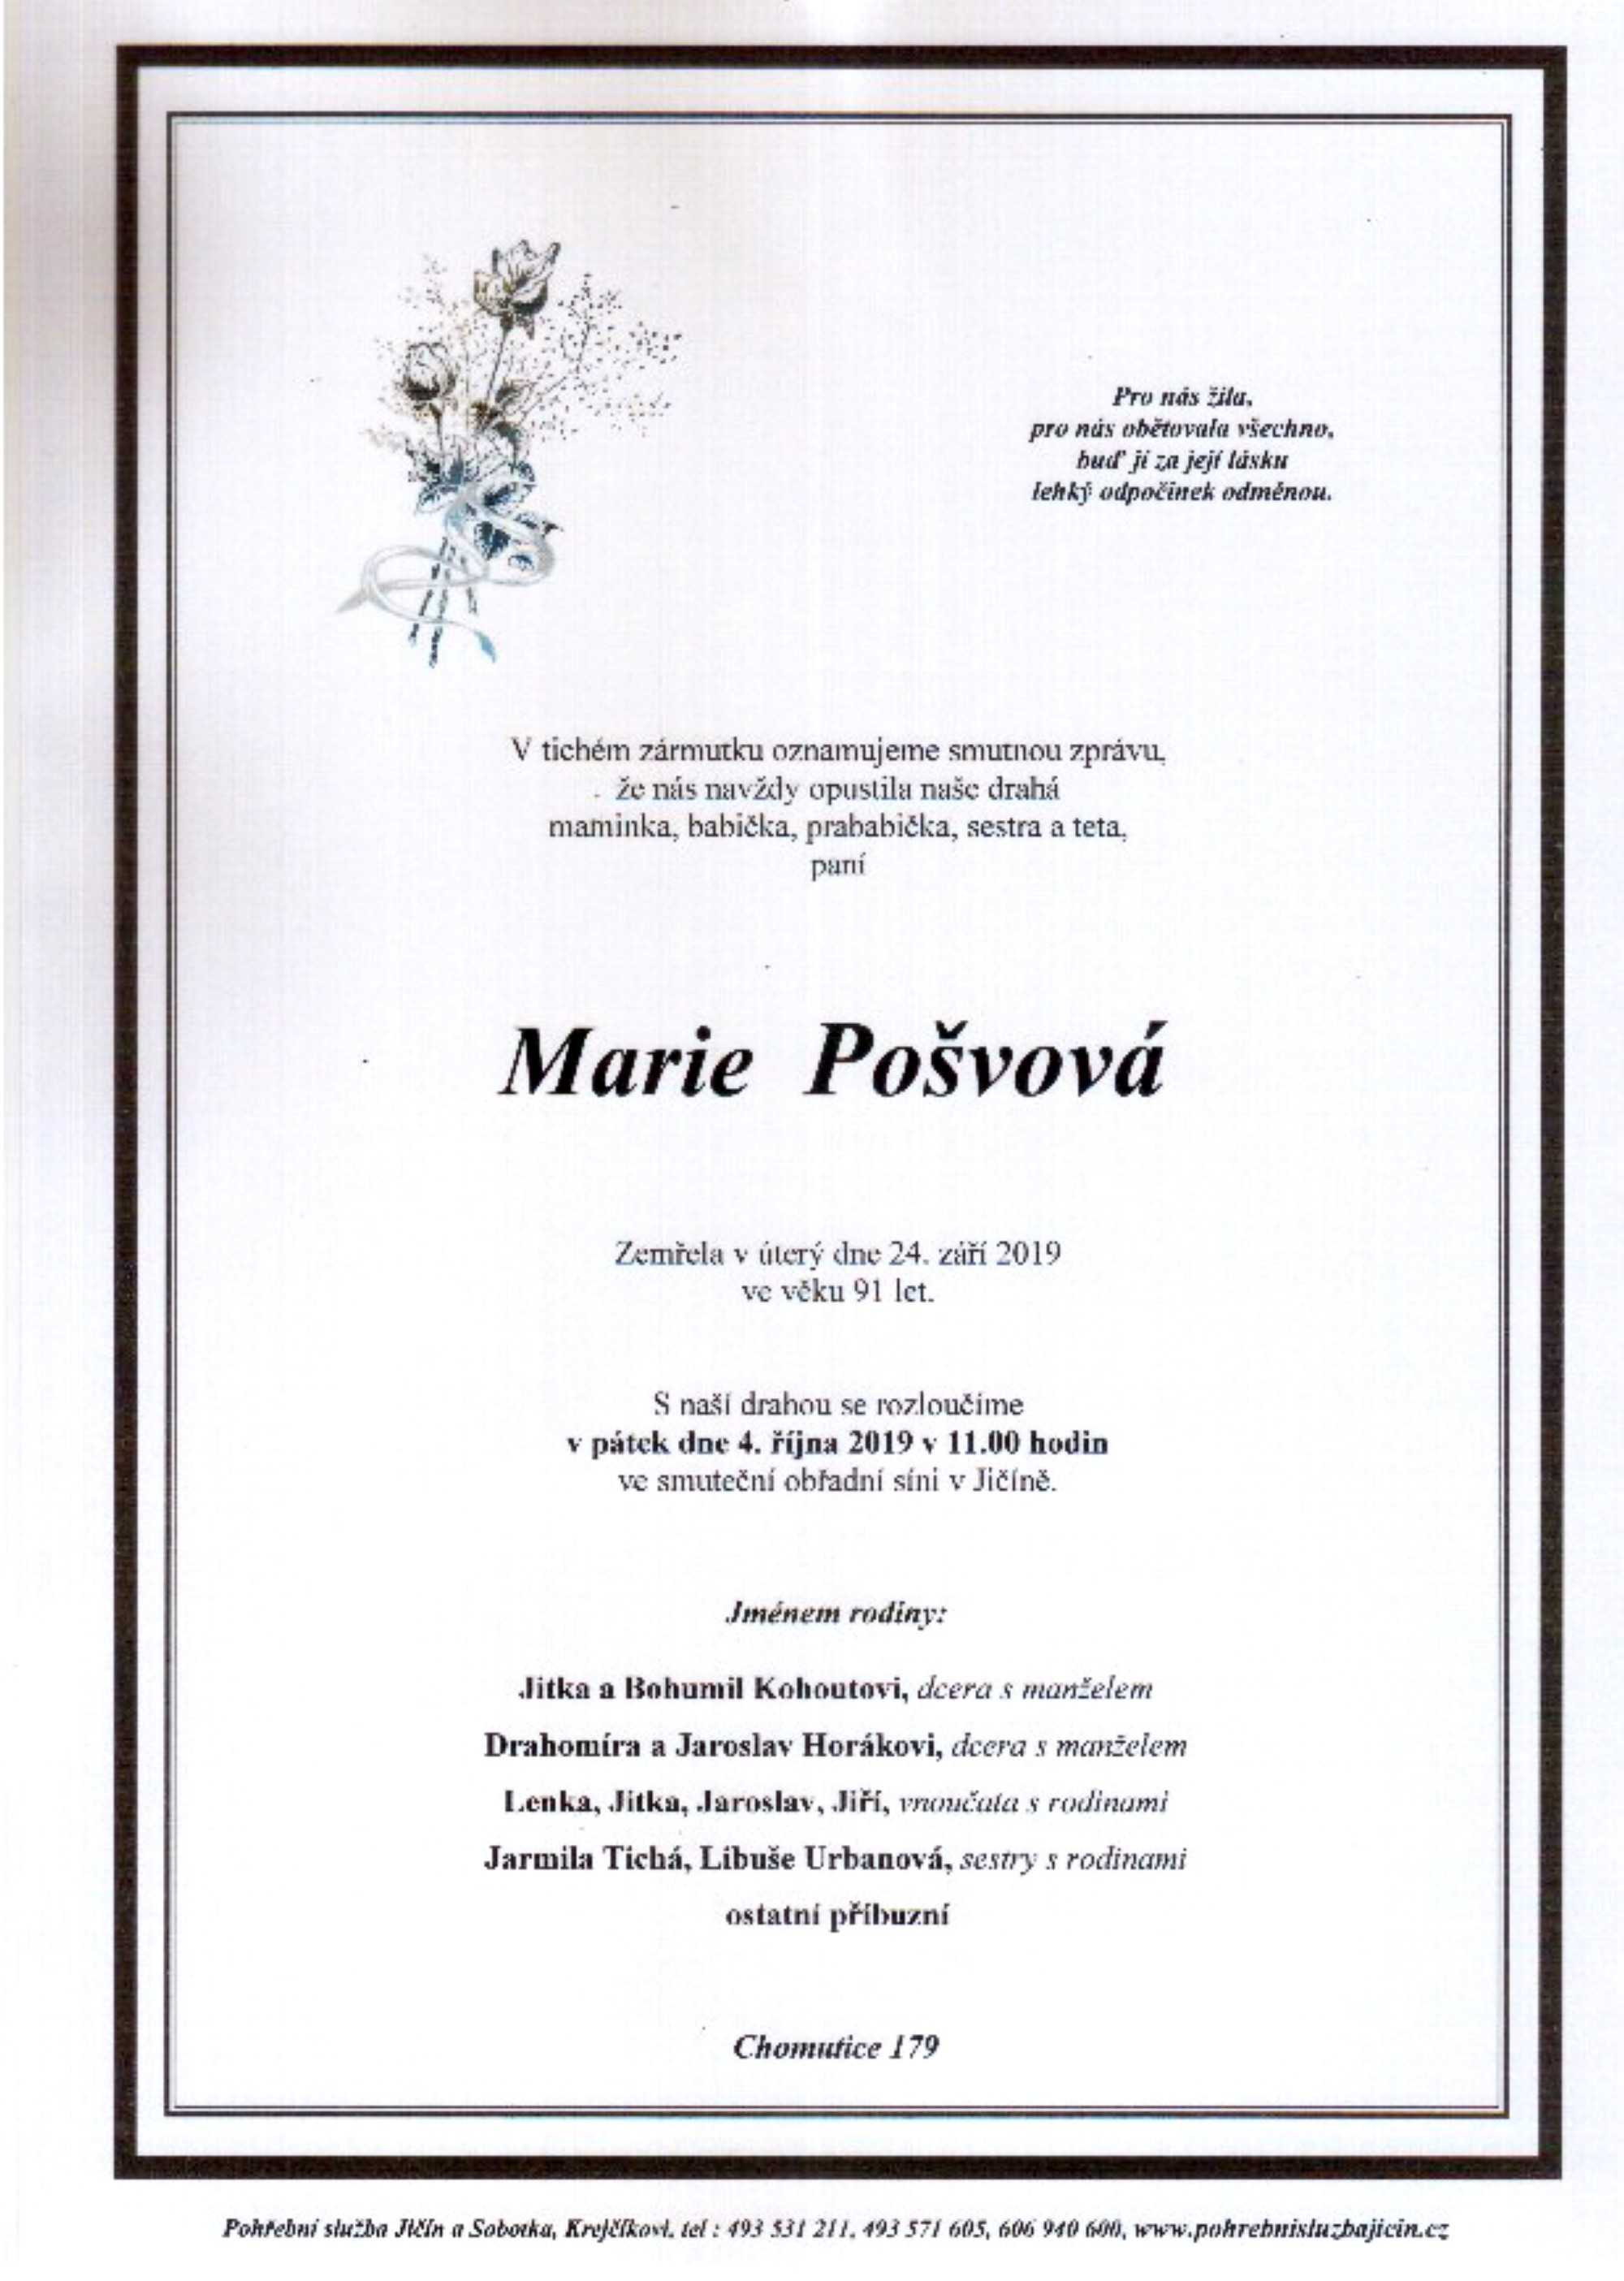 Marie Pošvová